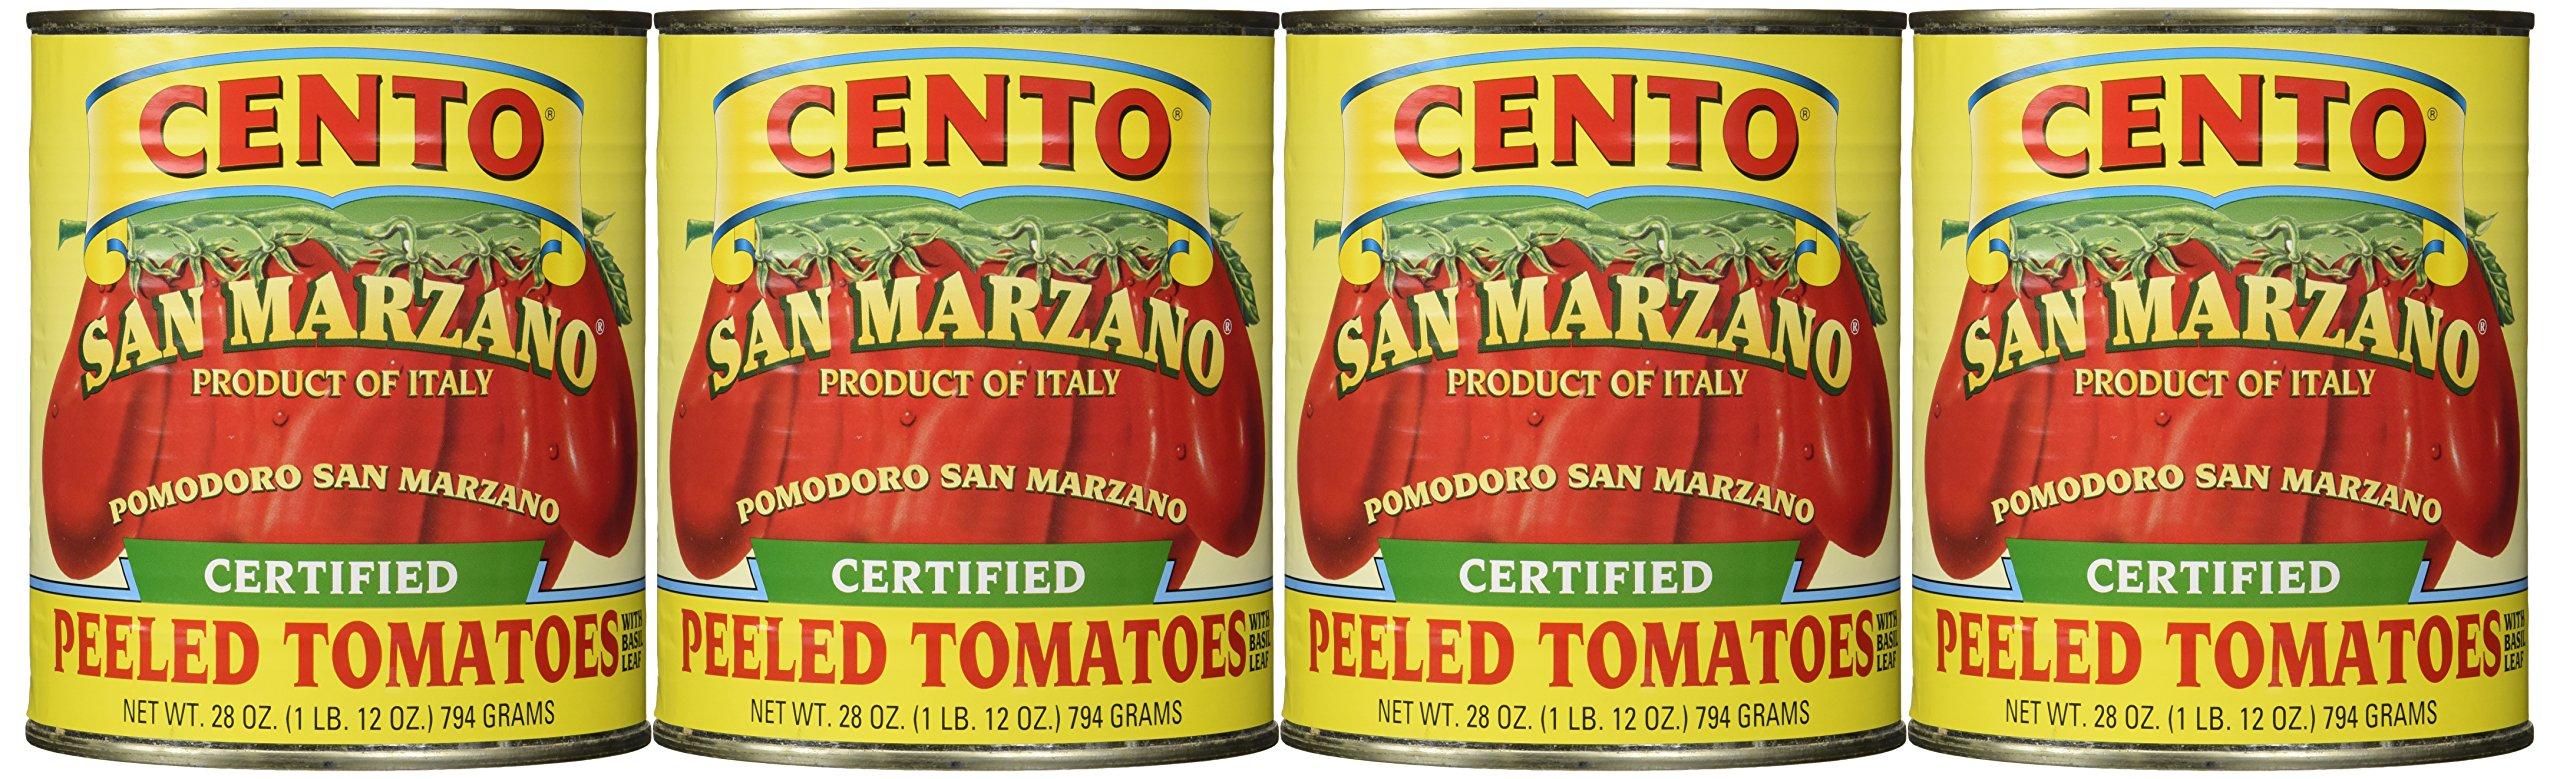 San Marzano Certified Cento Italian Peeled Tomatoes, Case of 4 /28 oz